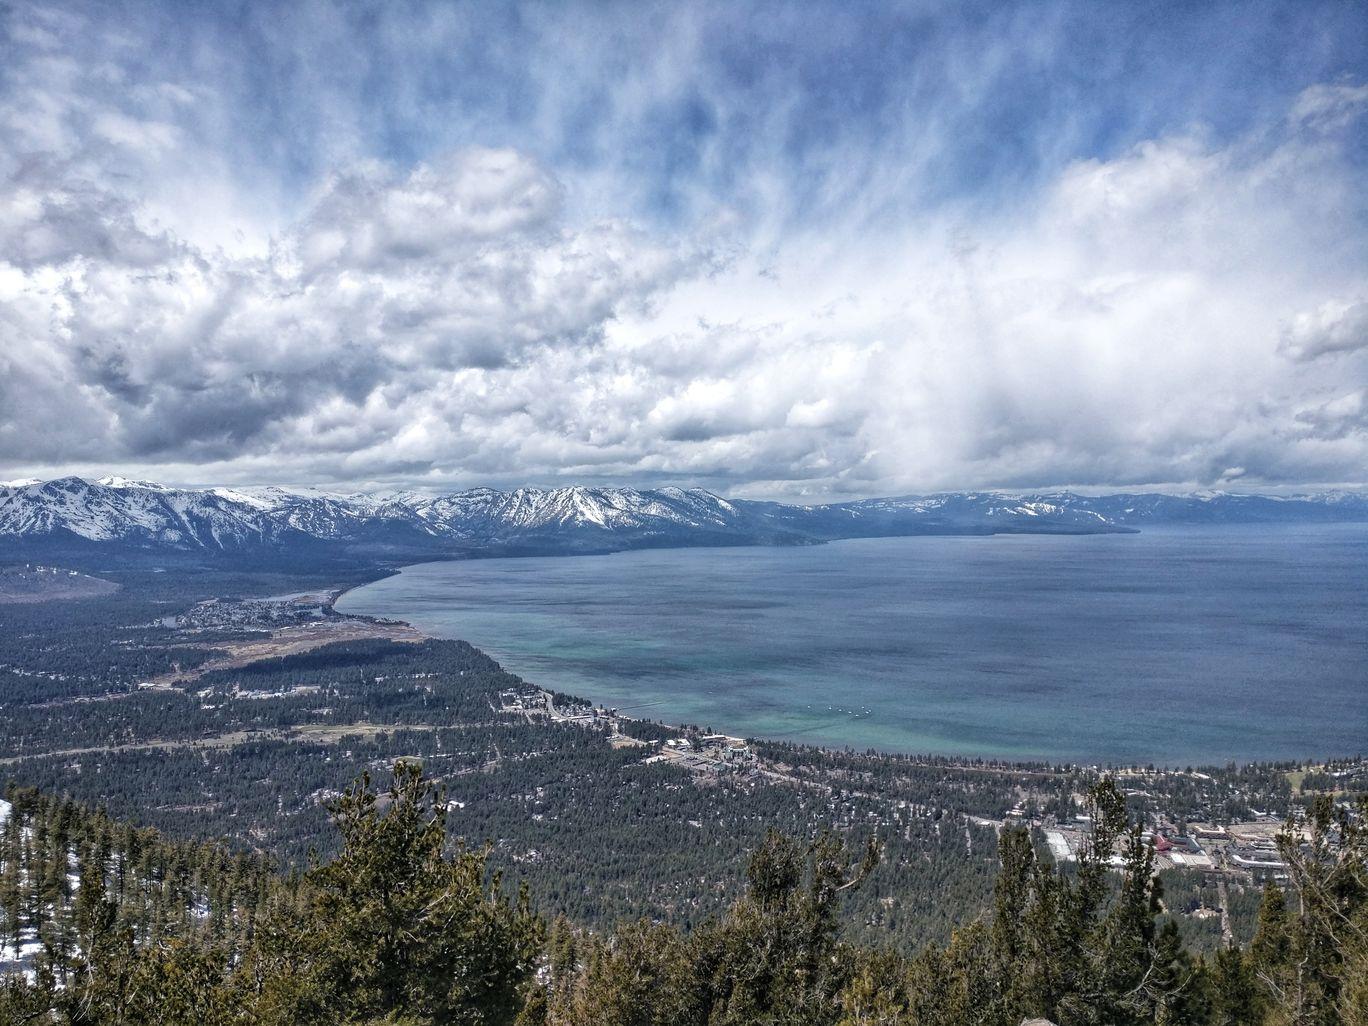 Photo of Heavenly Gondola Vista Point By Vinay Shankar